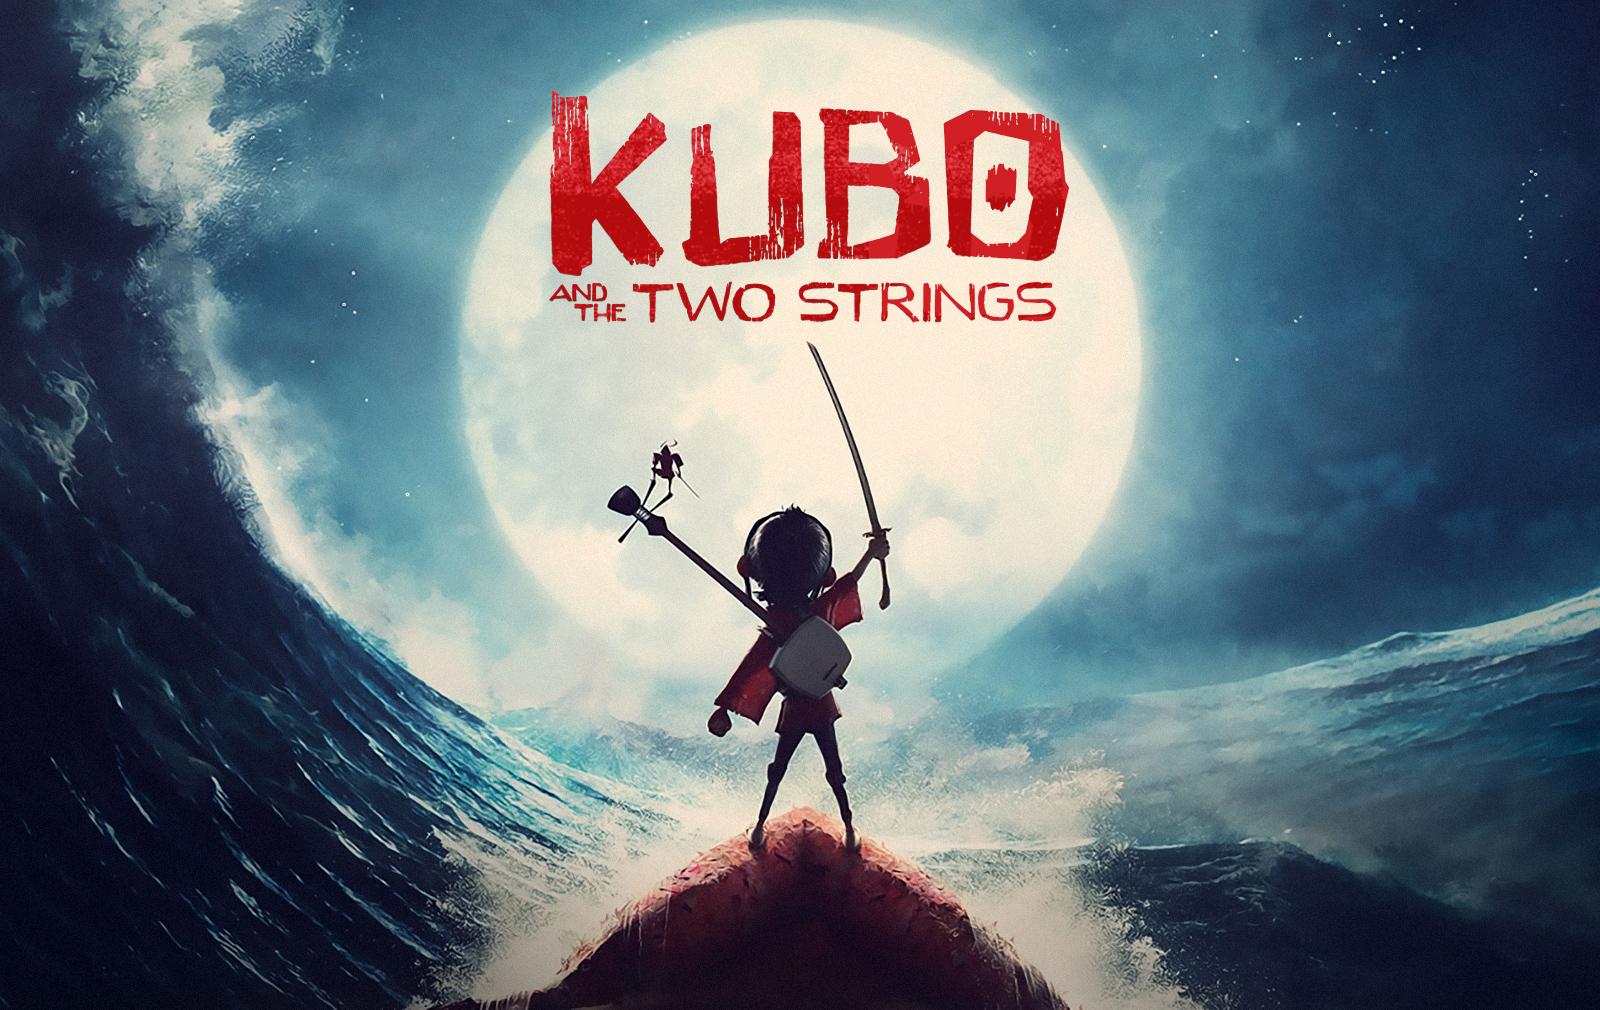 دانلود فیلم خارجی Kubo And The Two Strings با لینک مستقیم